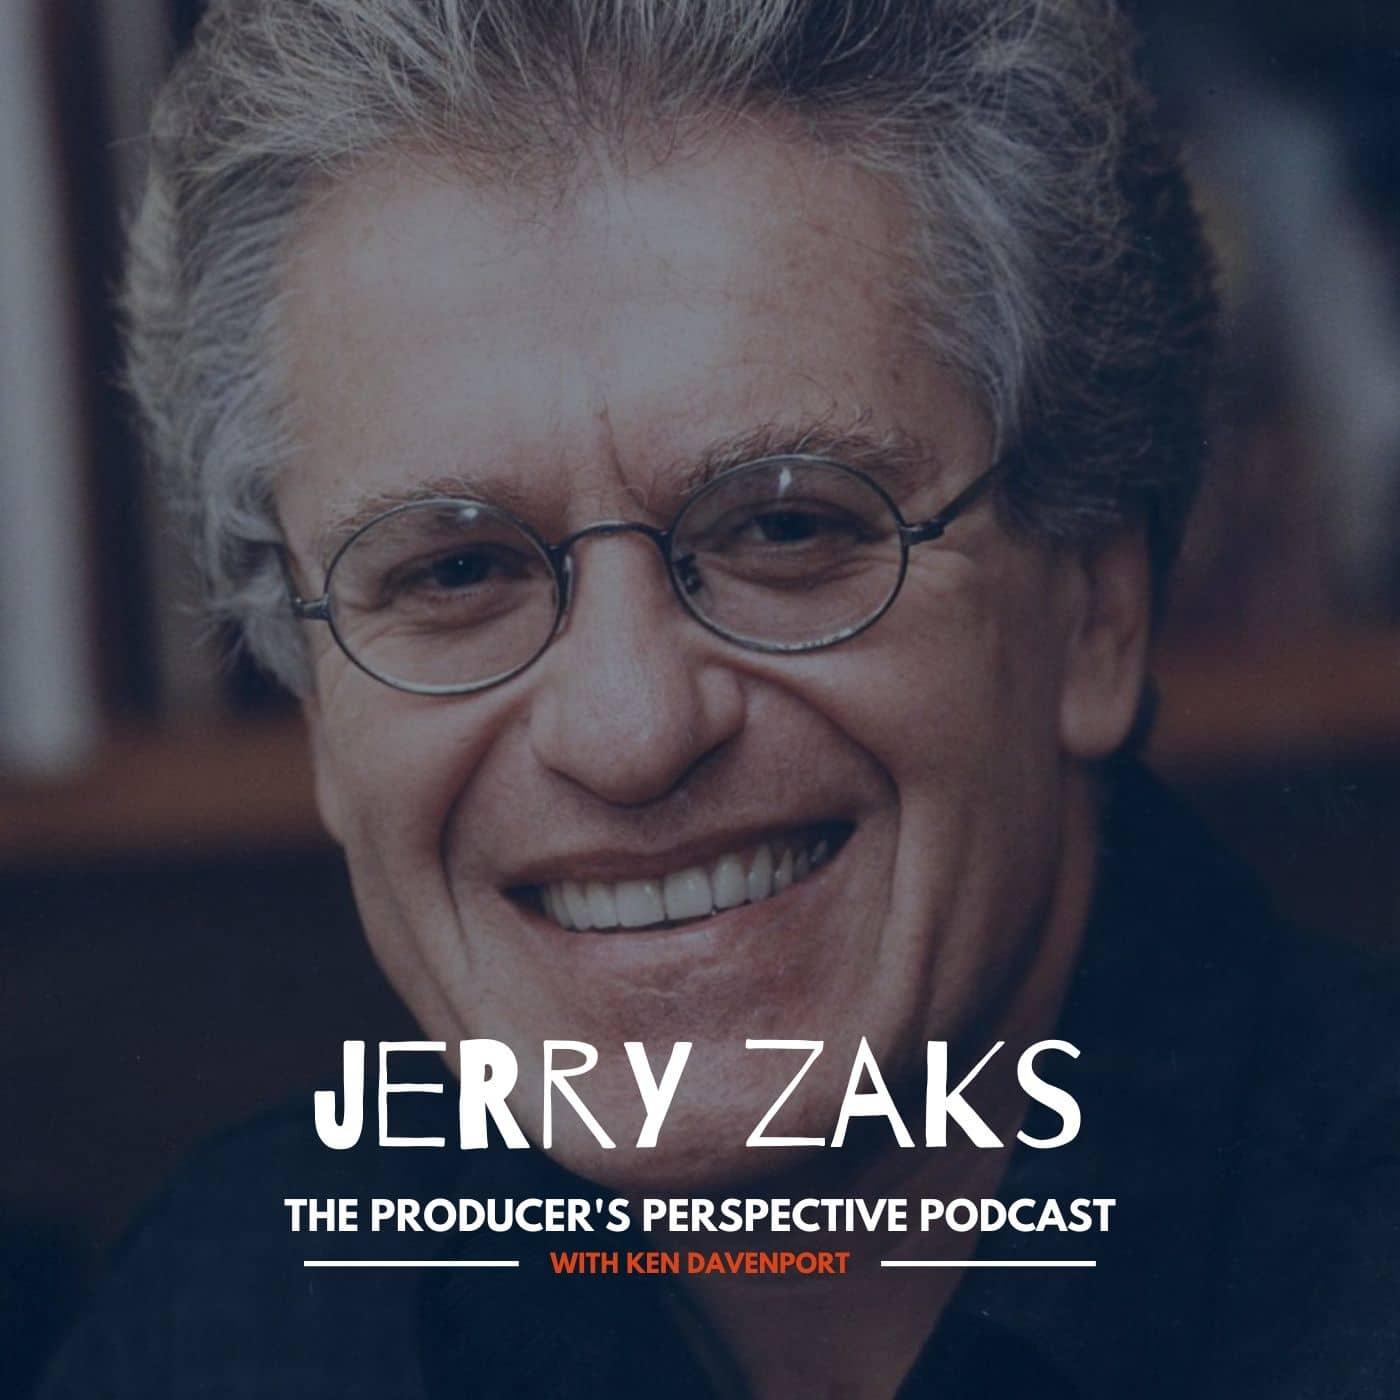 Ken Davenport's The Producer's Perspective Podcast Episode 142 - Jerry Zaks